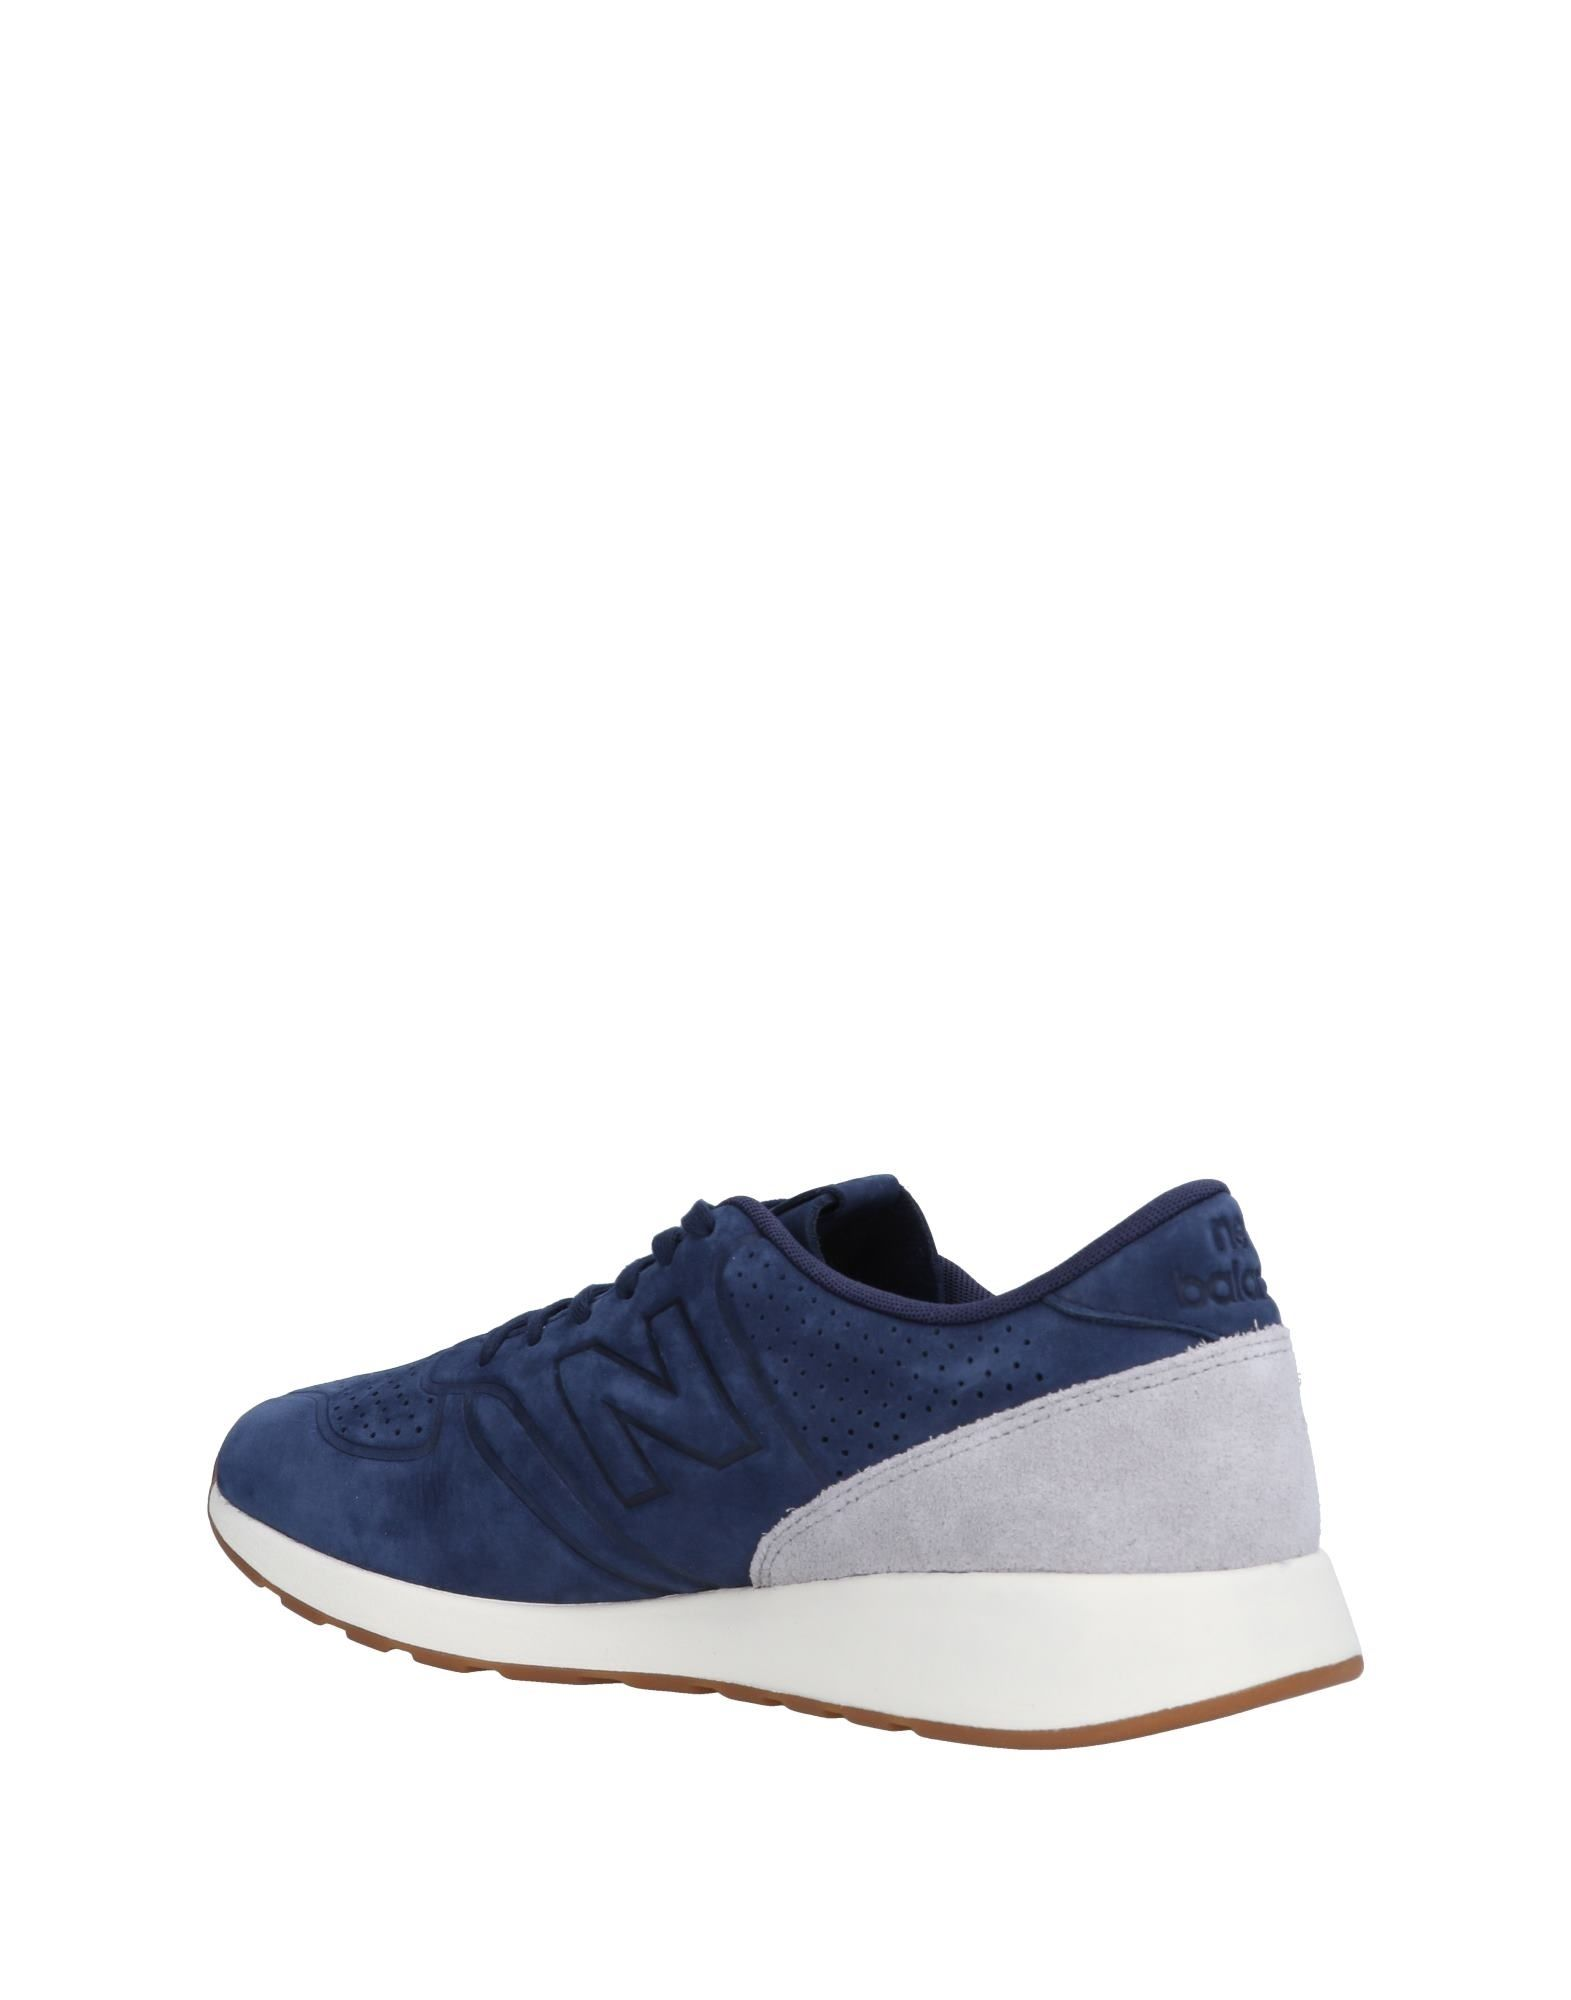 Rabatt echte Schuhe New Balance Sneakers Herren  11497715MH 11497715MH 11497715MH 9e4007